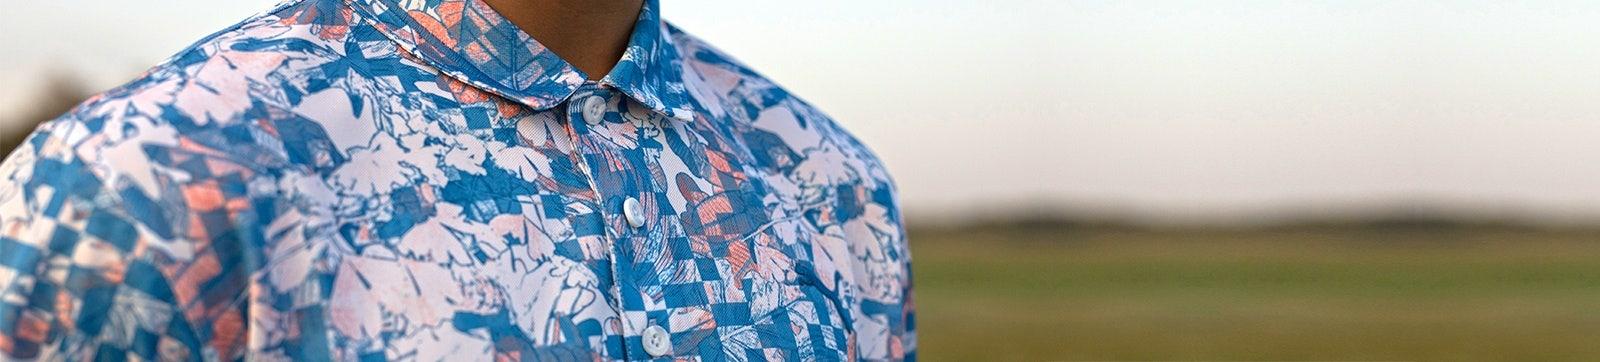 Statement Print Golf Shirts